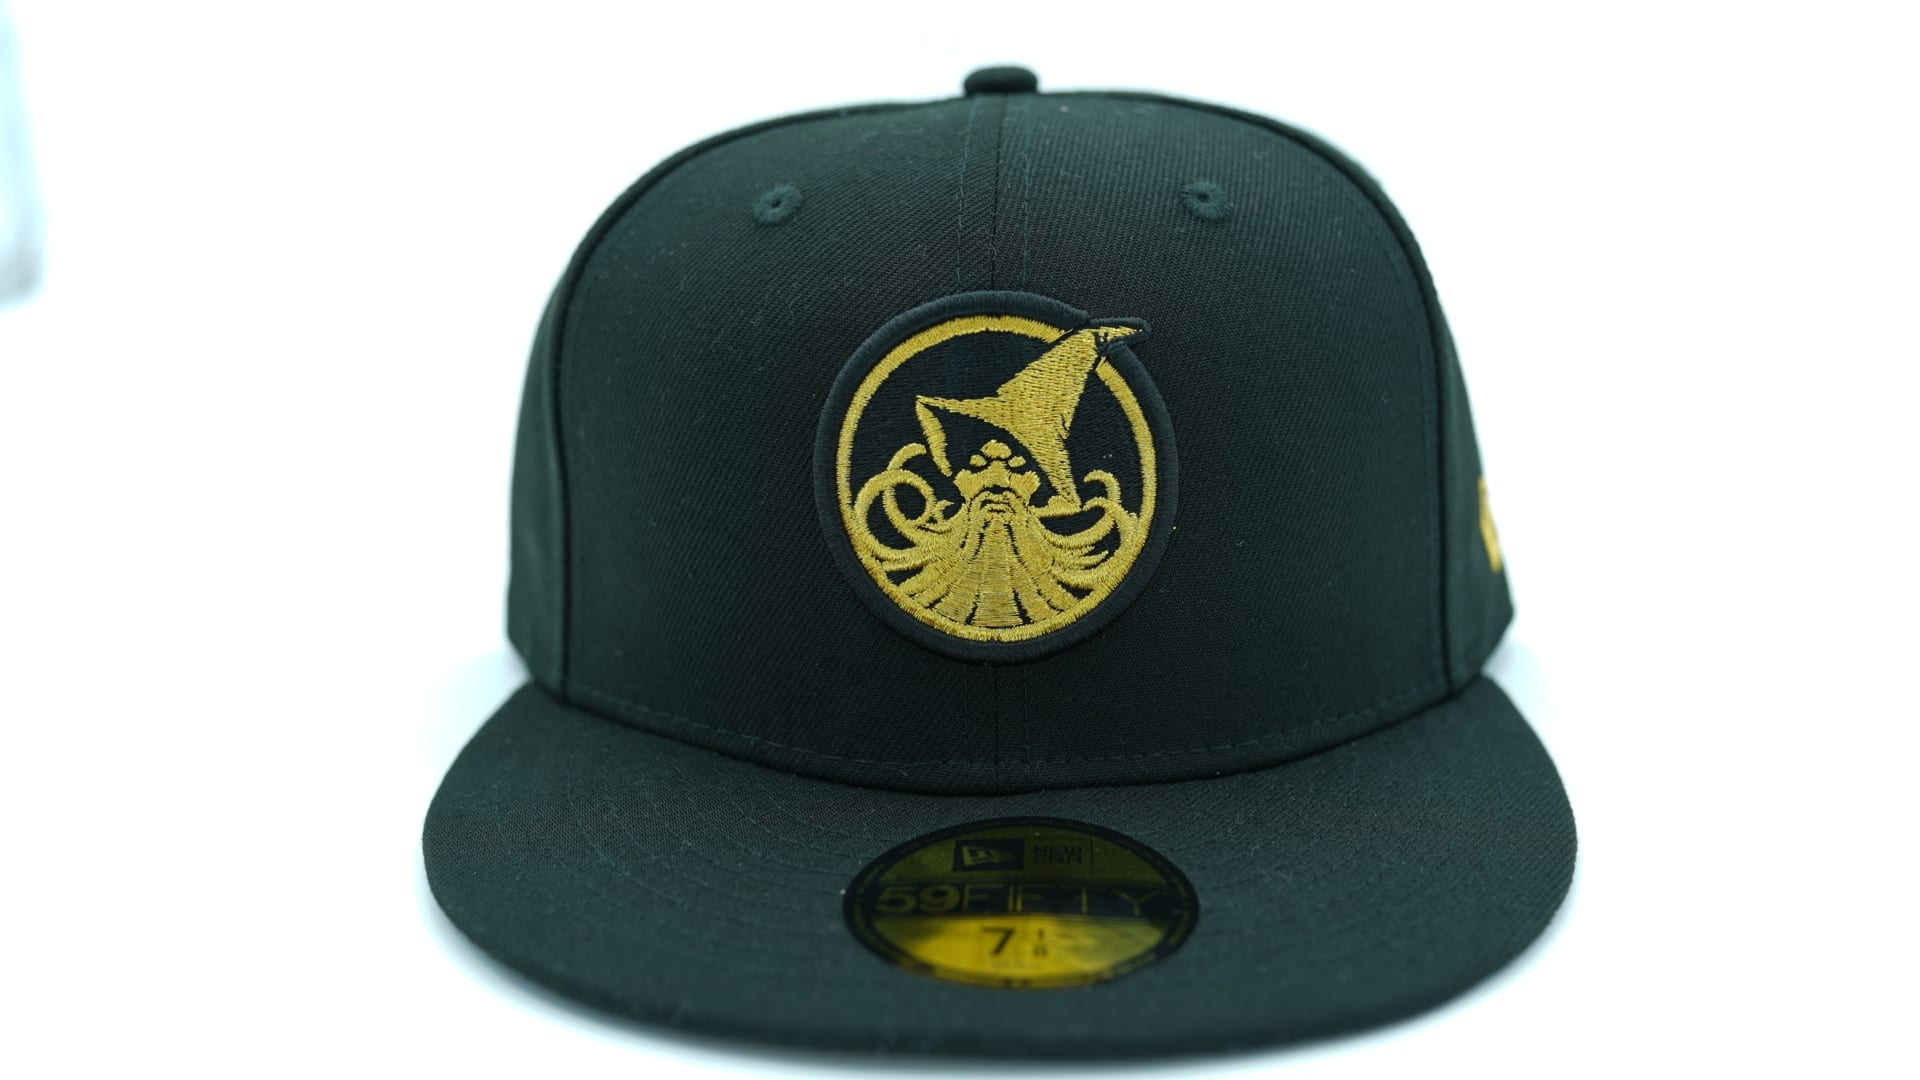 new york yankees chambray mint blue 59fifty fitted baseball cap new era mlb 1